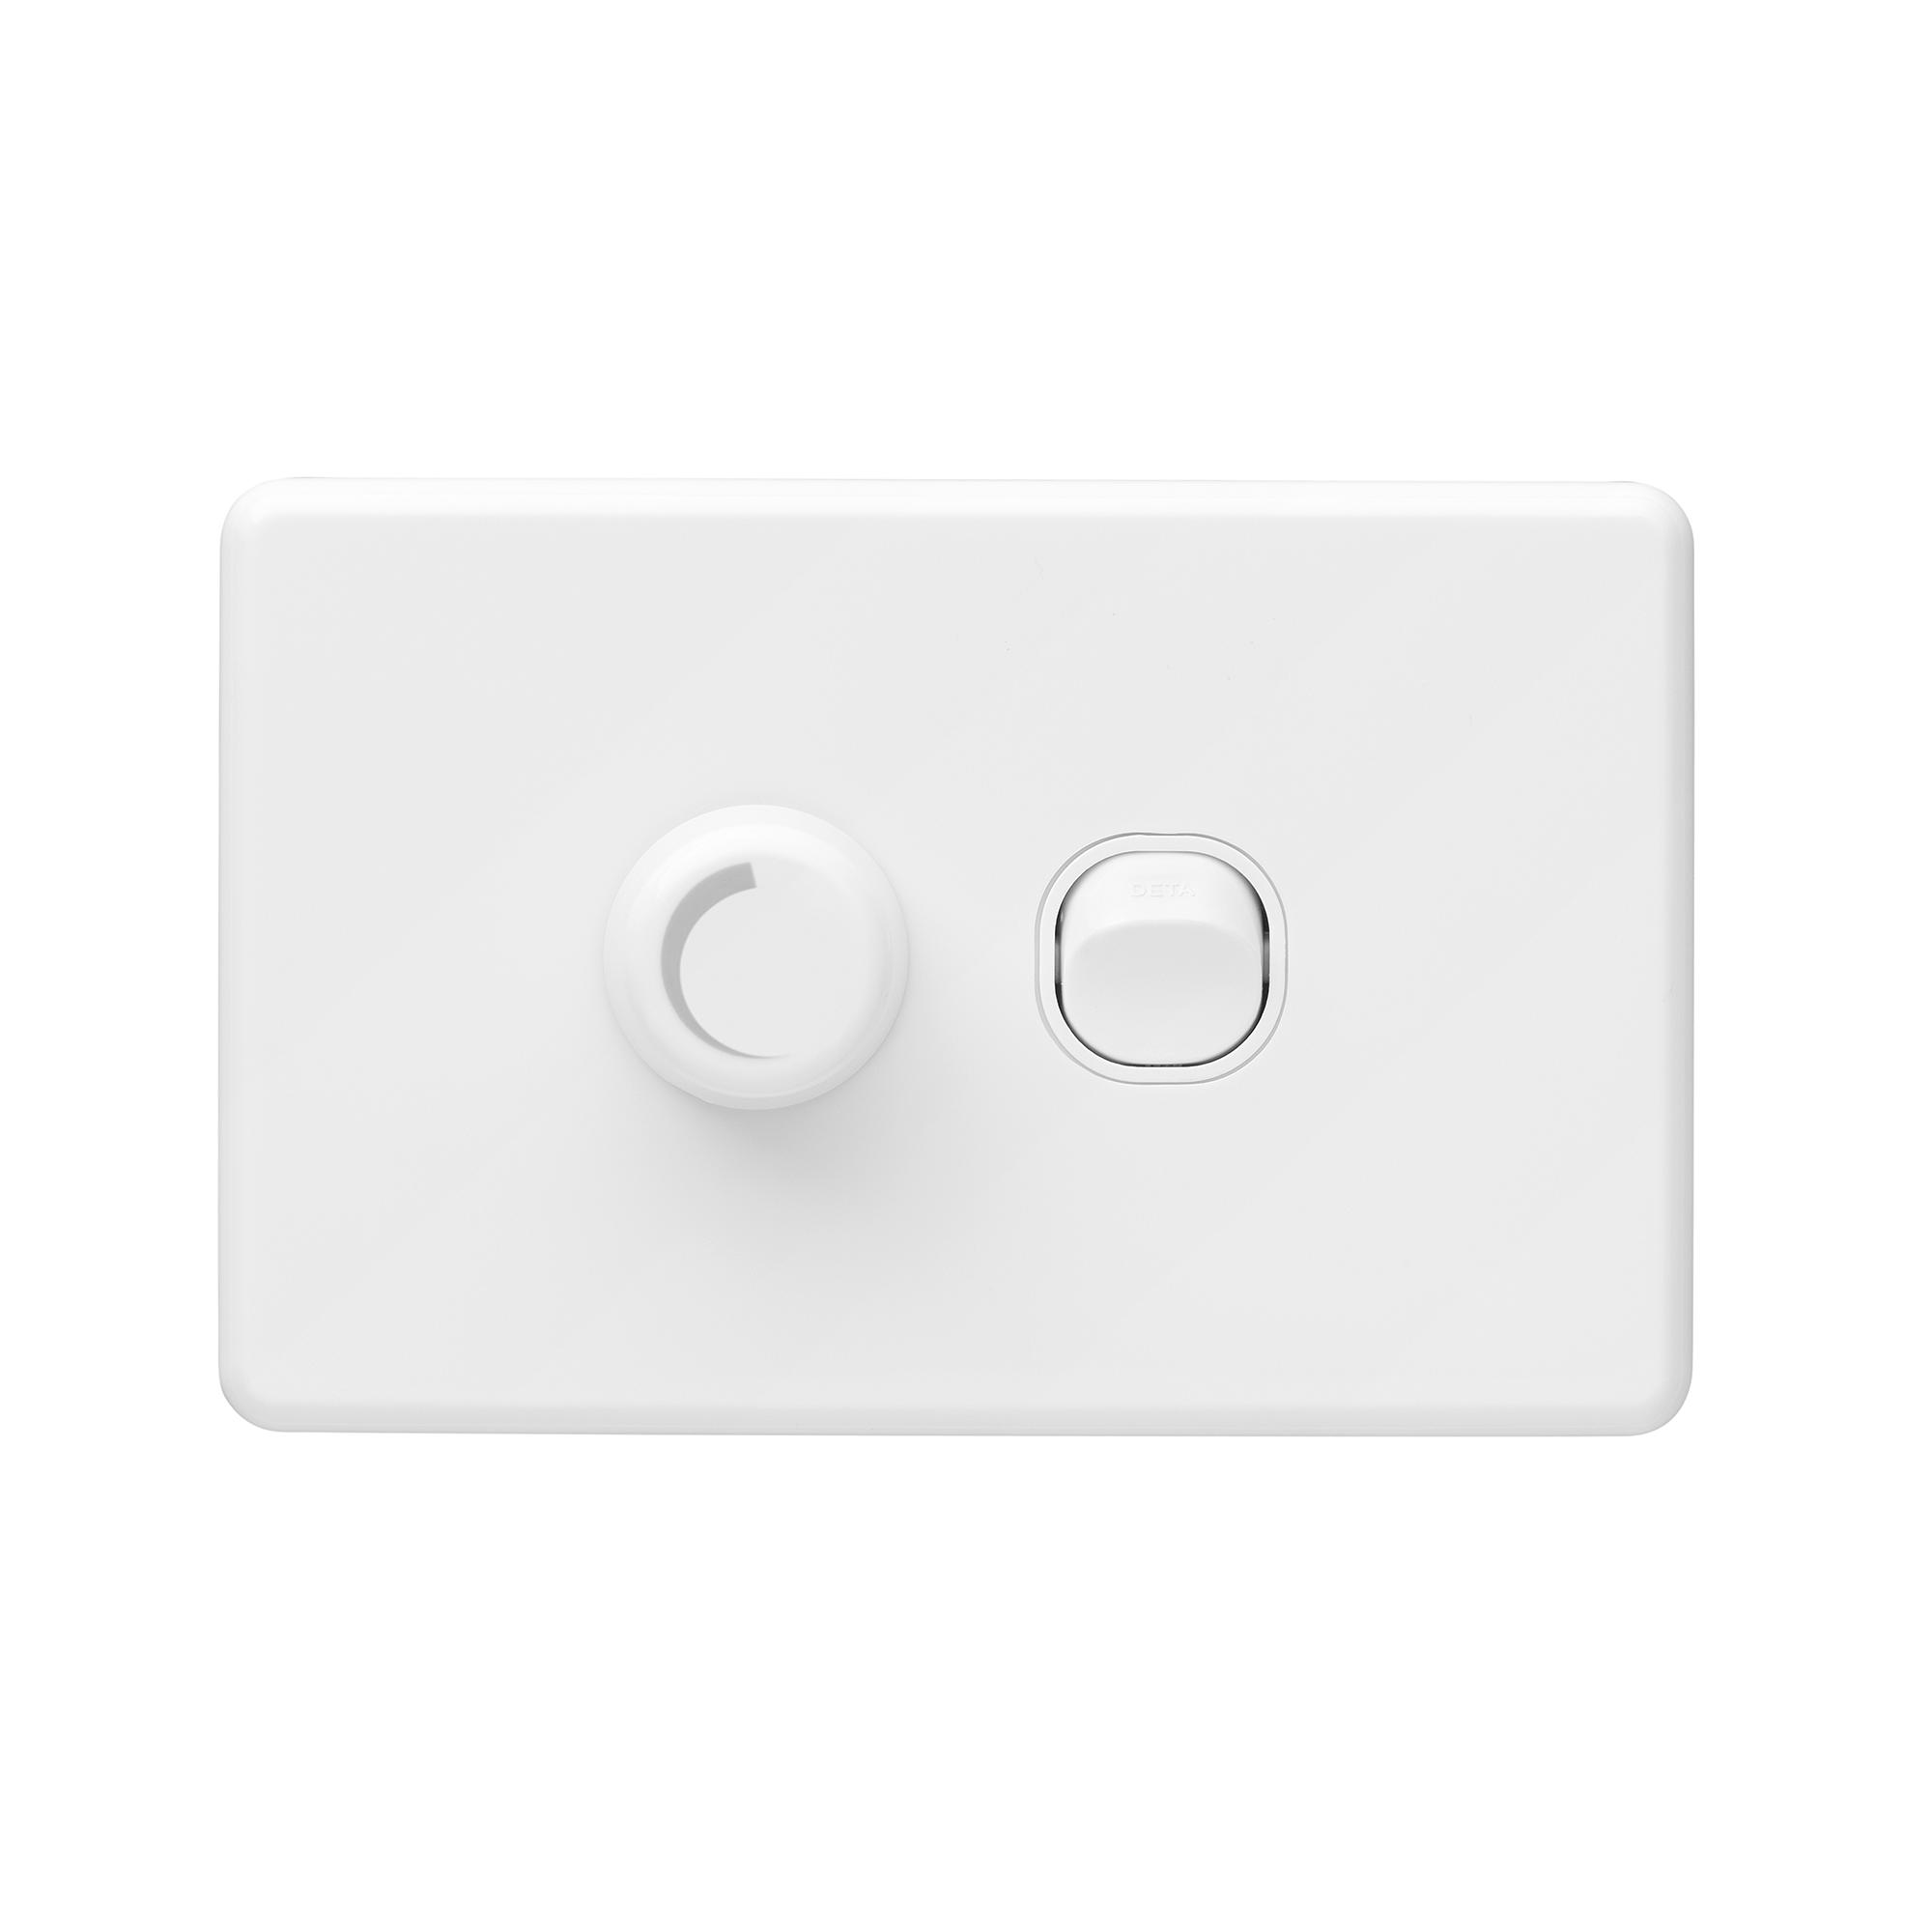 150w x6 univ electronic dimmer